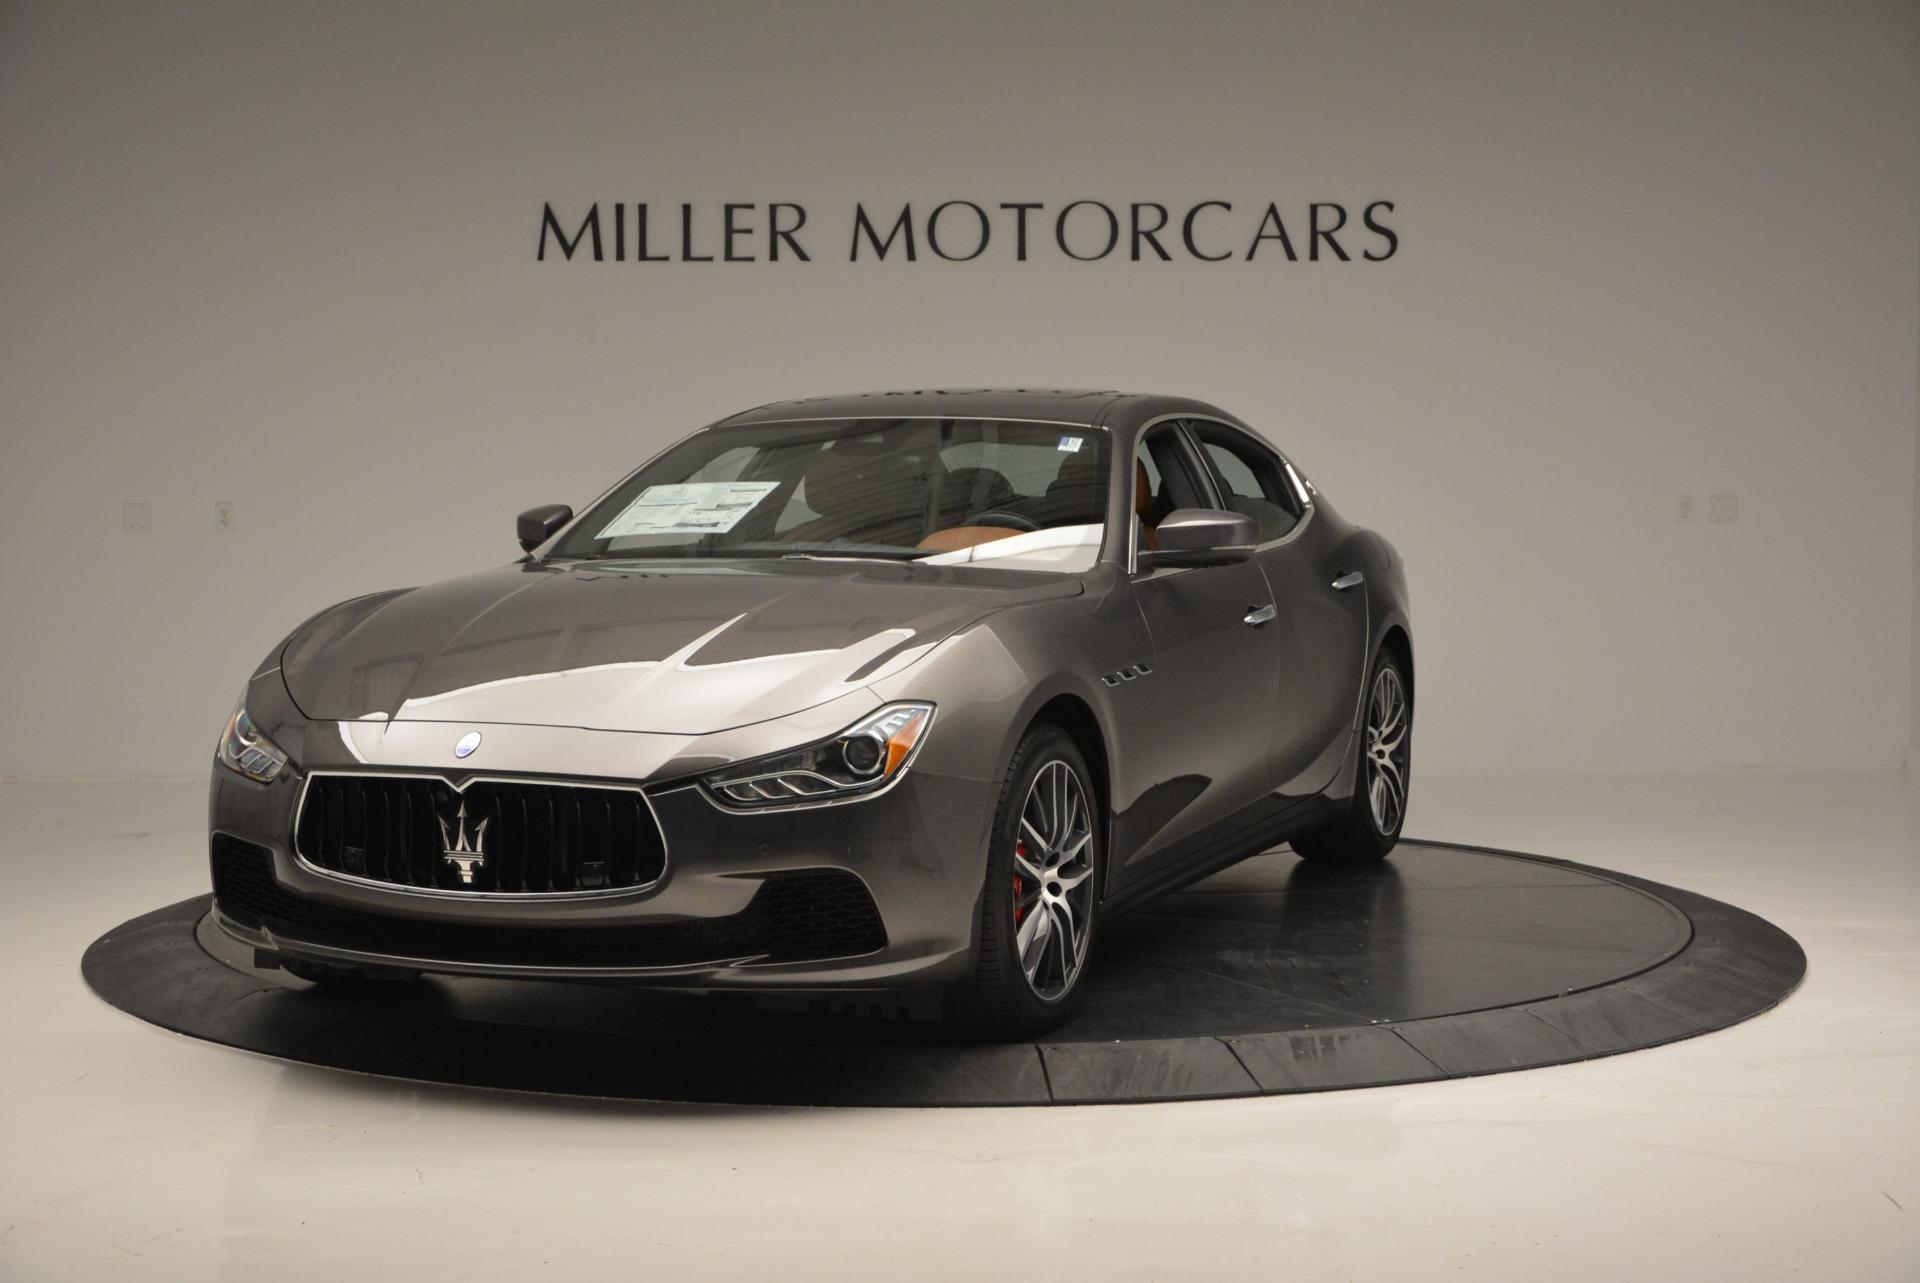 Used 2018 Maserati Ghibli S Q4 for sale Sold at Alfa Romeo of Greenwich in Greenwich CT 06830 1